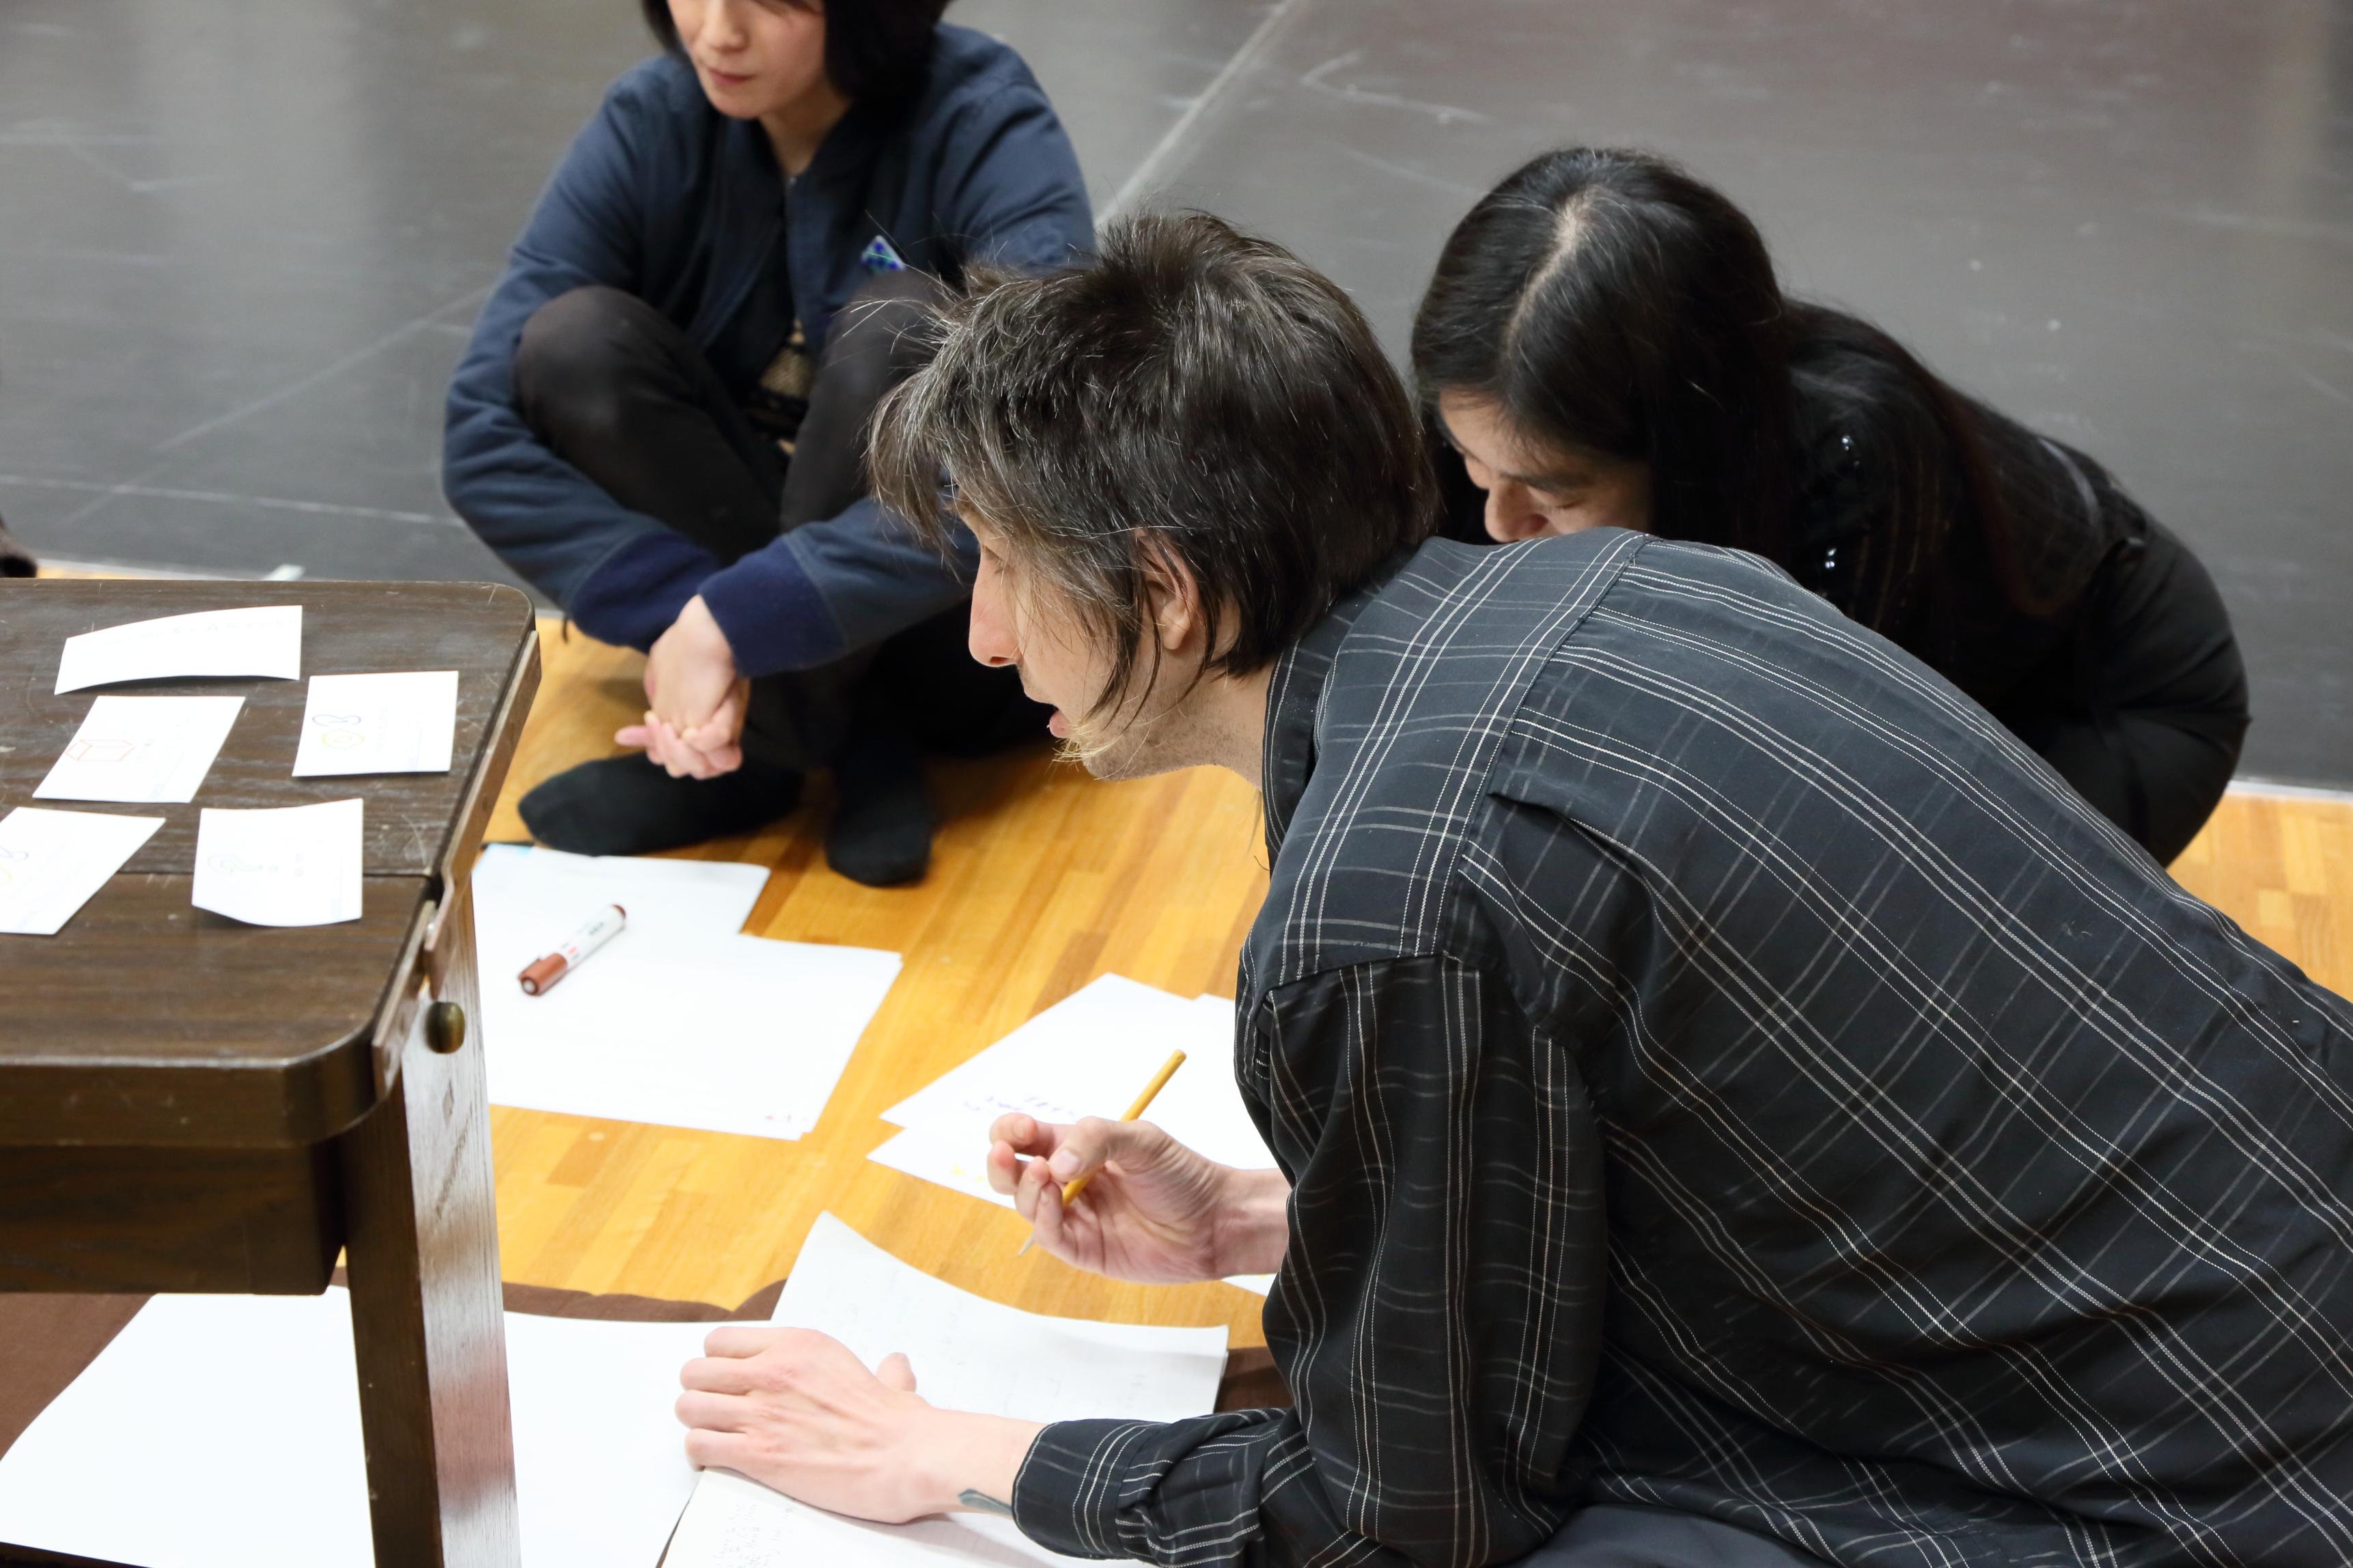 『KAC TRIAL PROGRAM Vol.1 DANCE ~若手振付家による作品制作~ 試演会』(2016)の様子